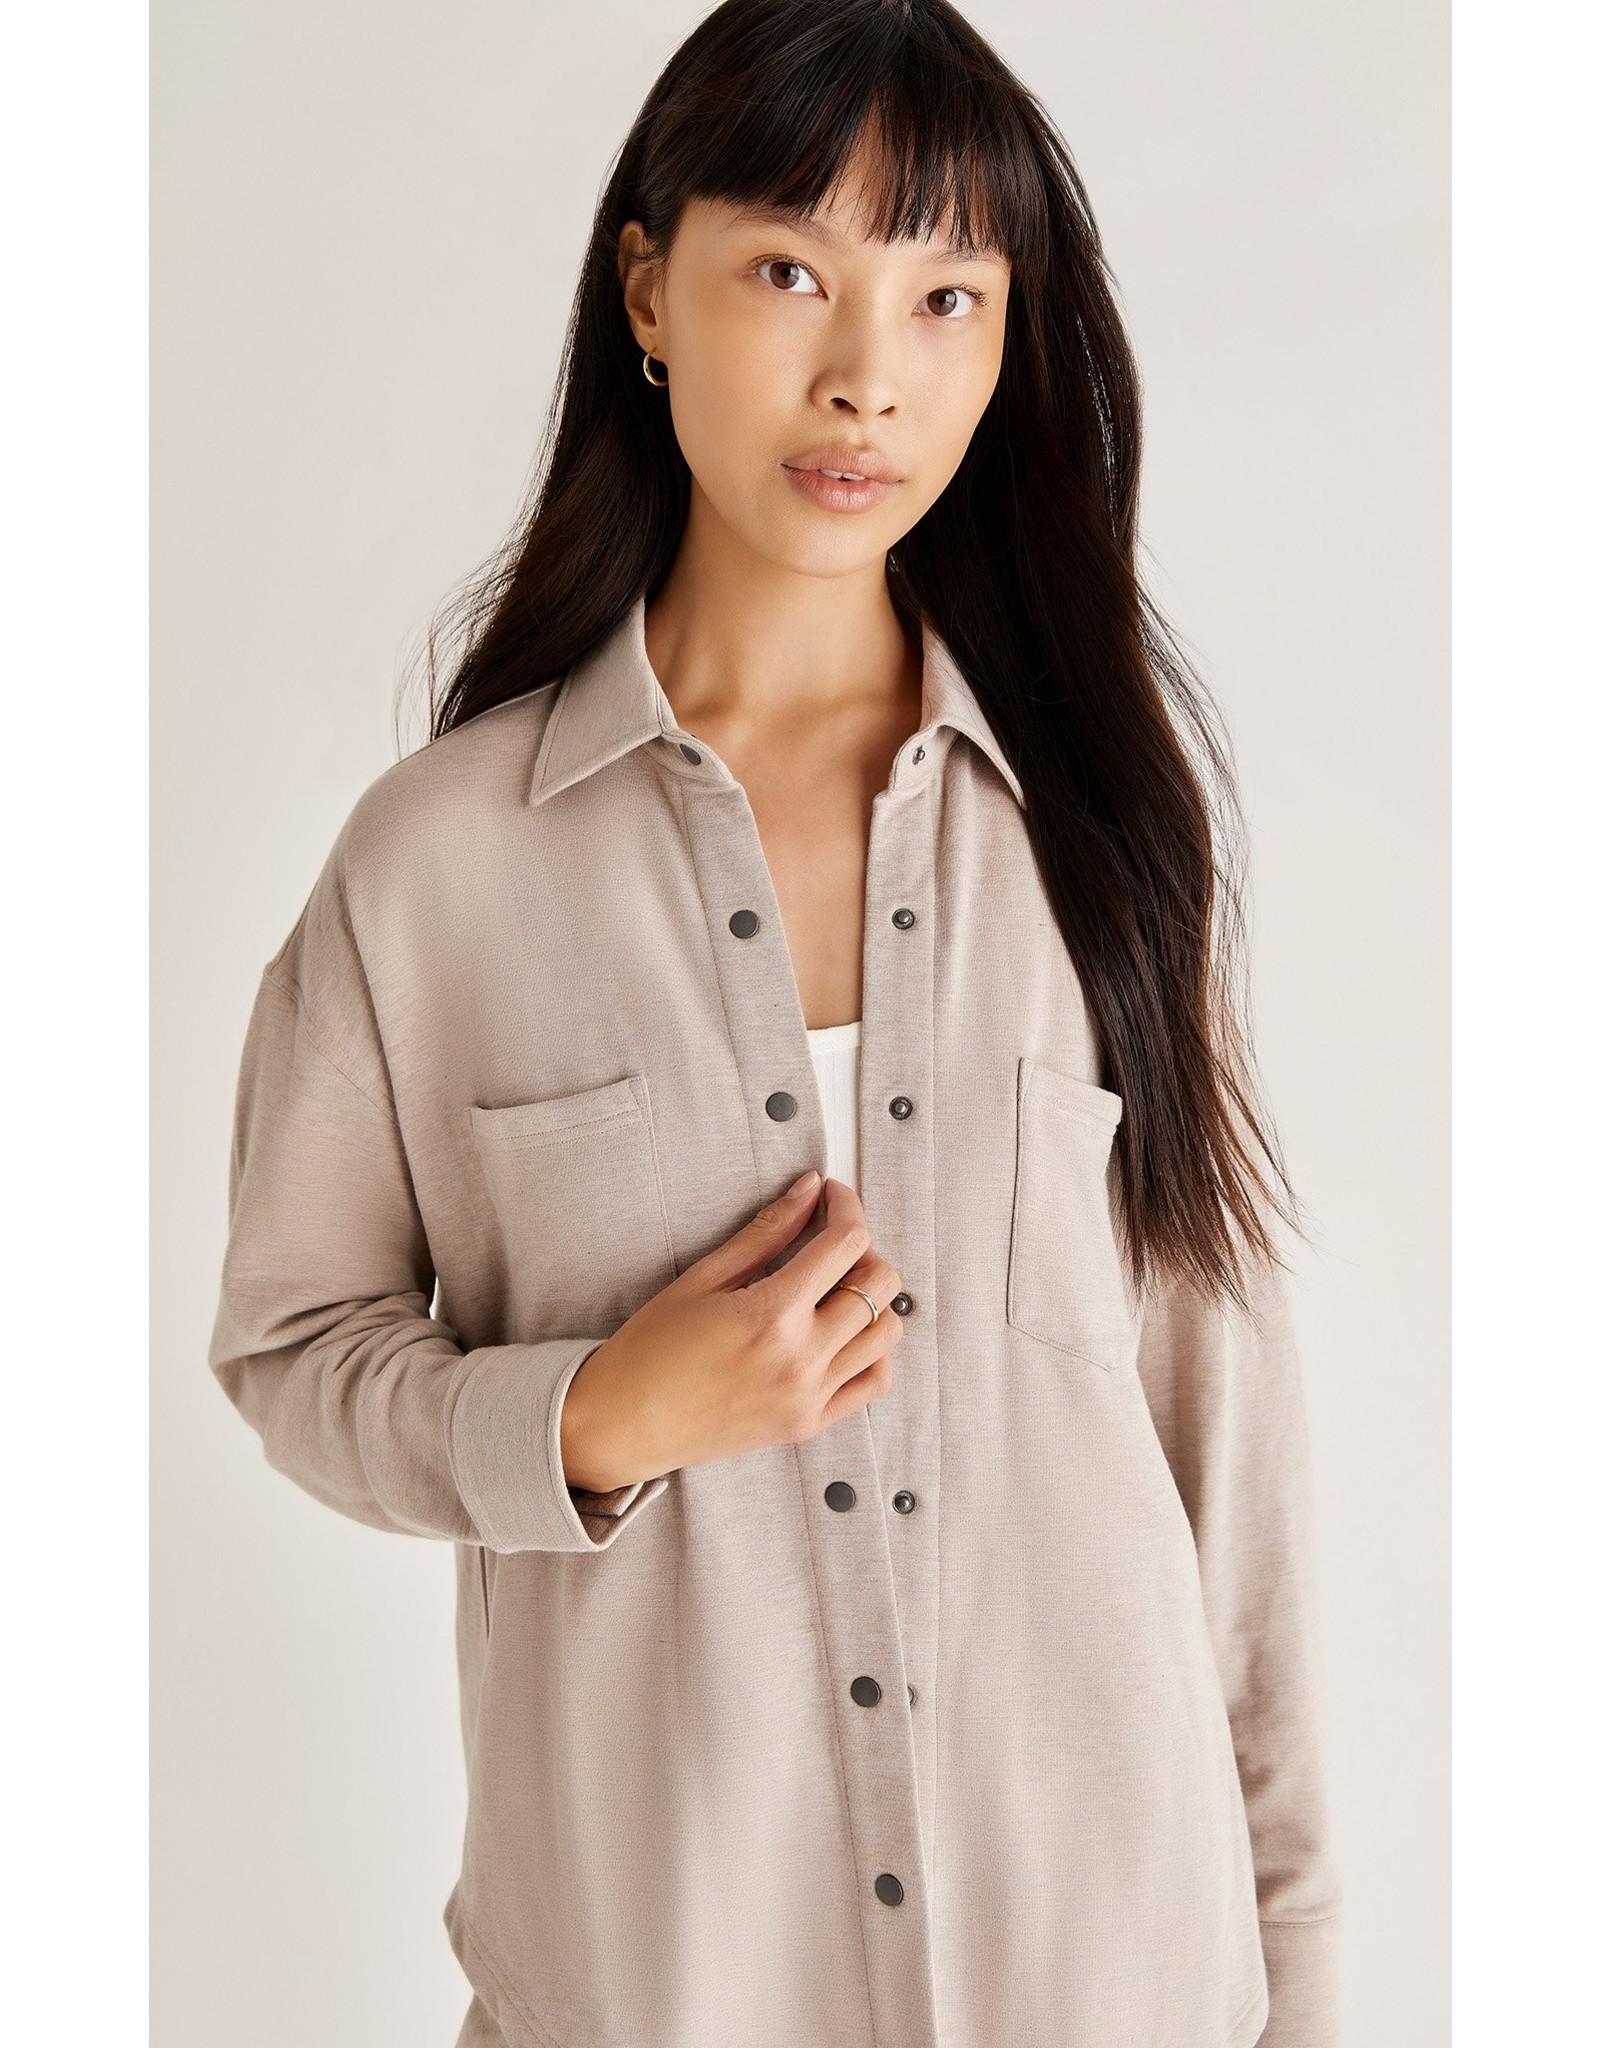 Z Supply ZSUPPLY WFH Modal Shirt Jacket